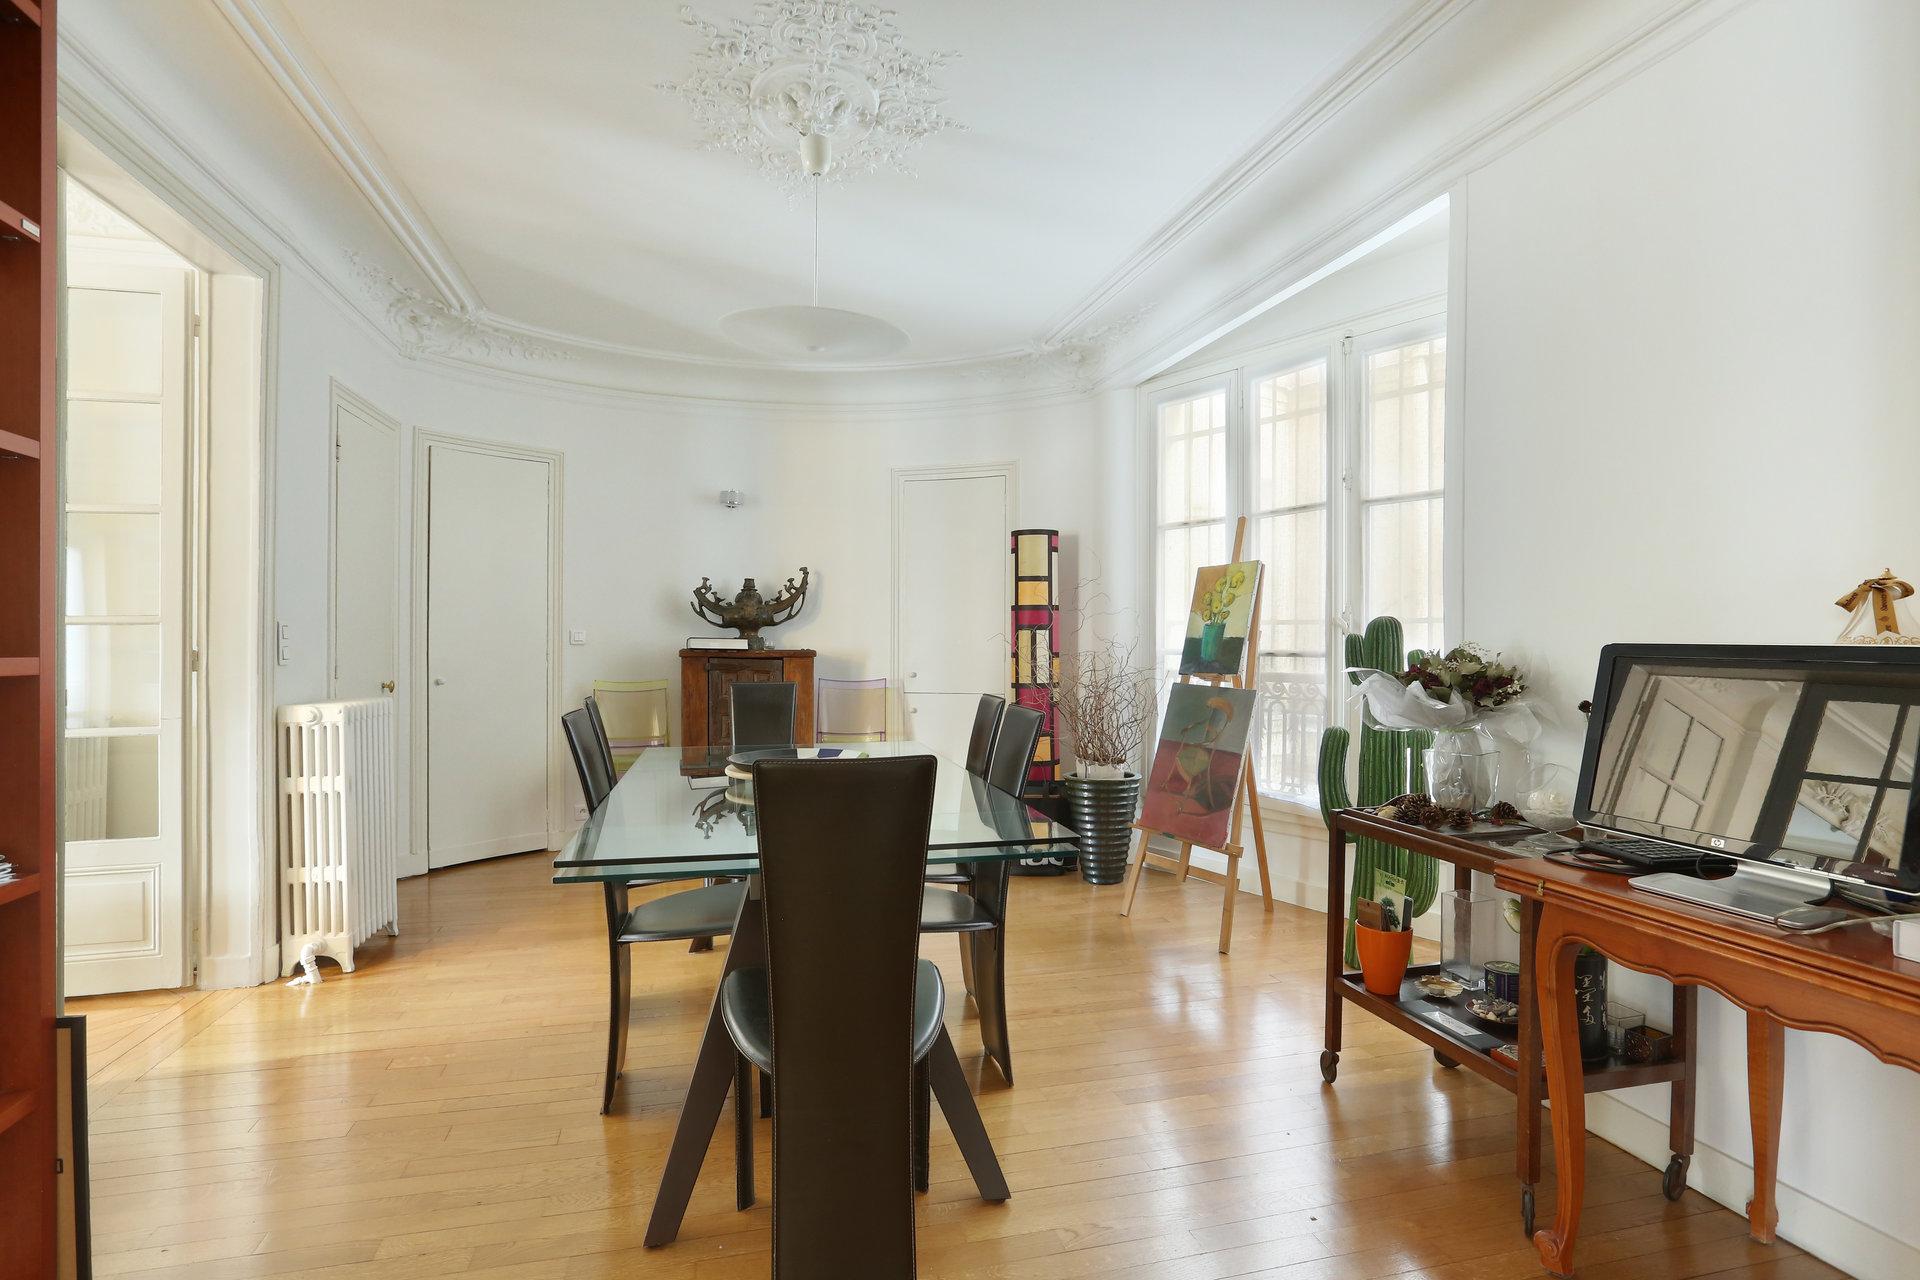 Saint Germain/Solferino 5 pièces 141 m²